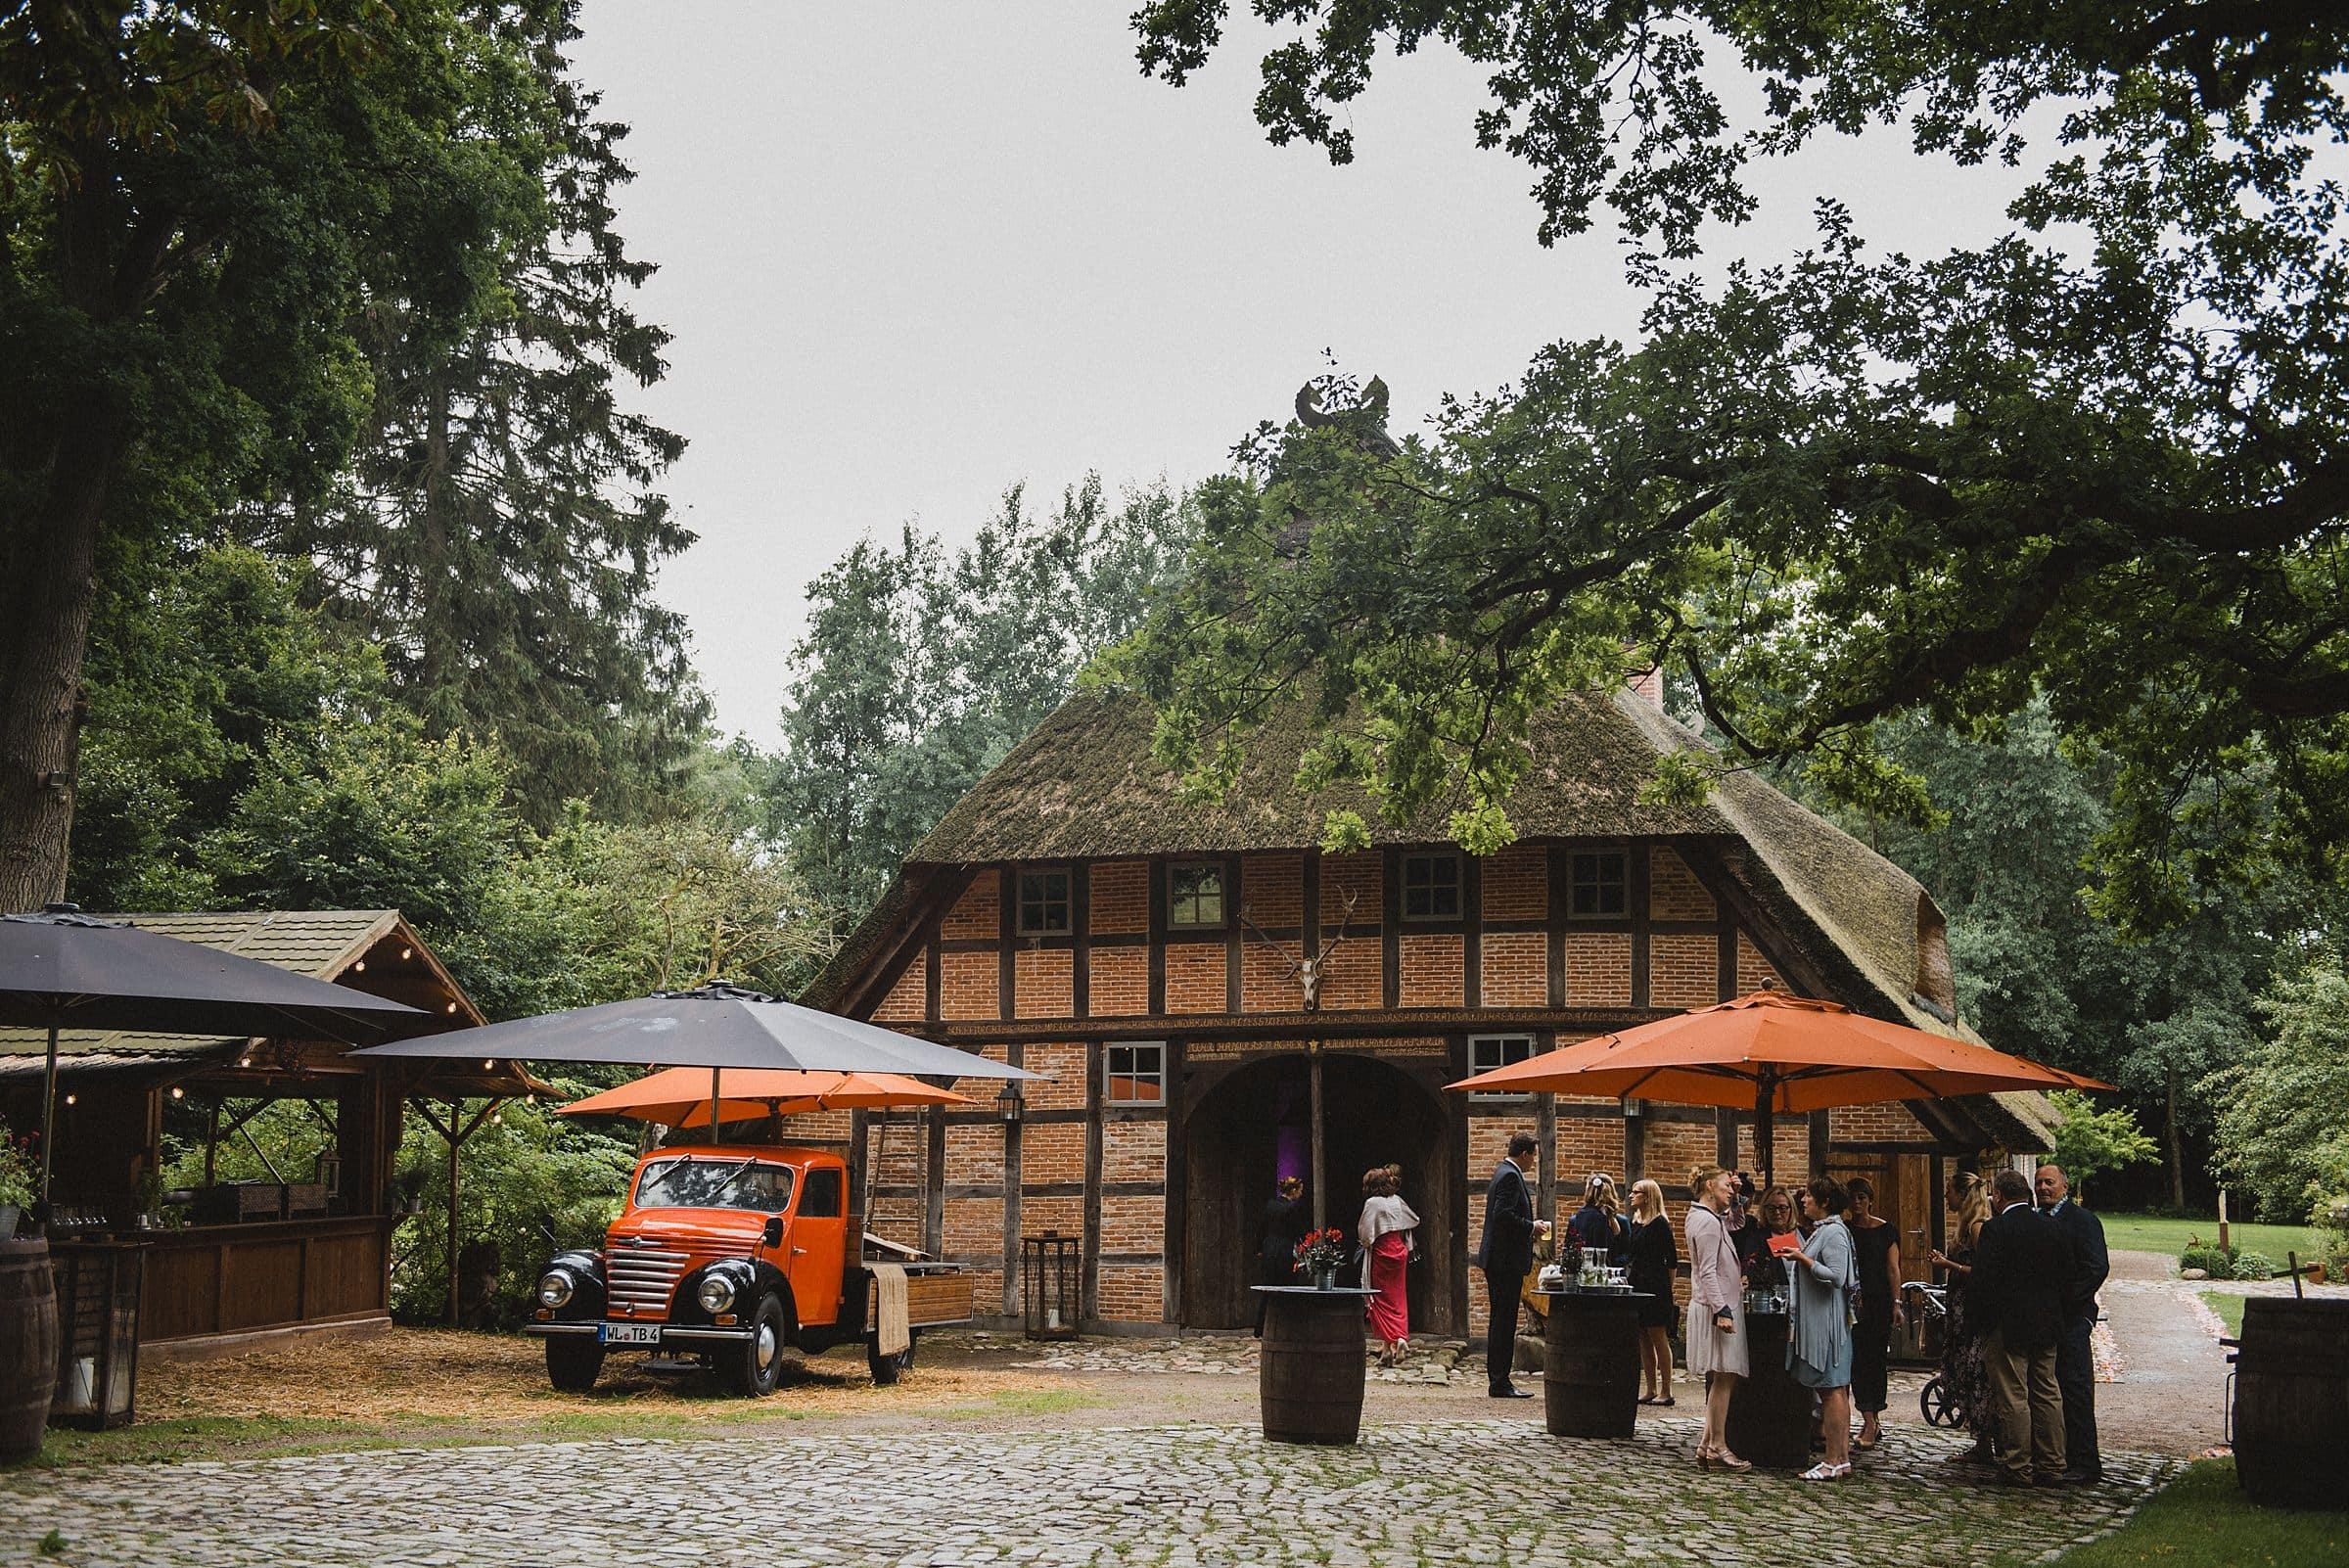 Hochzeitsfotografie-Frau-Siemers-Hof Weihe-Location